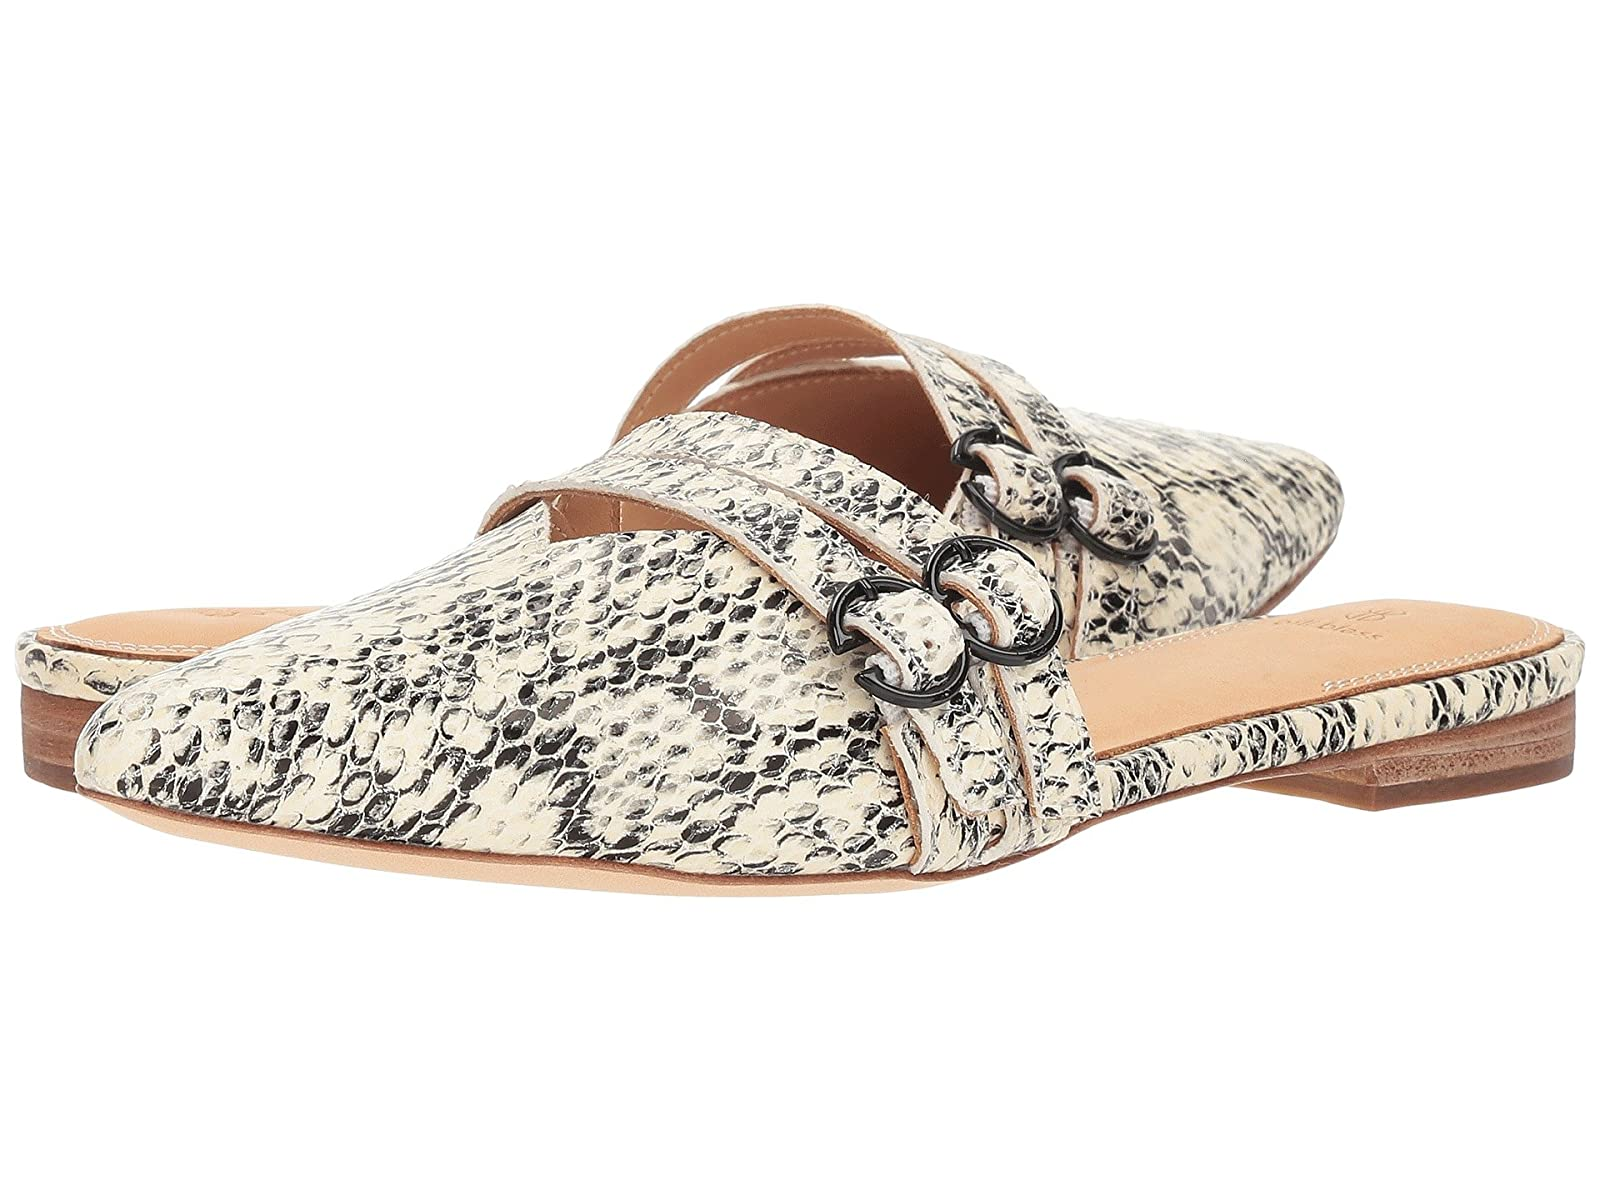 Bill Blass SelenaAtmospheric grades have affordable shoes